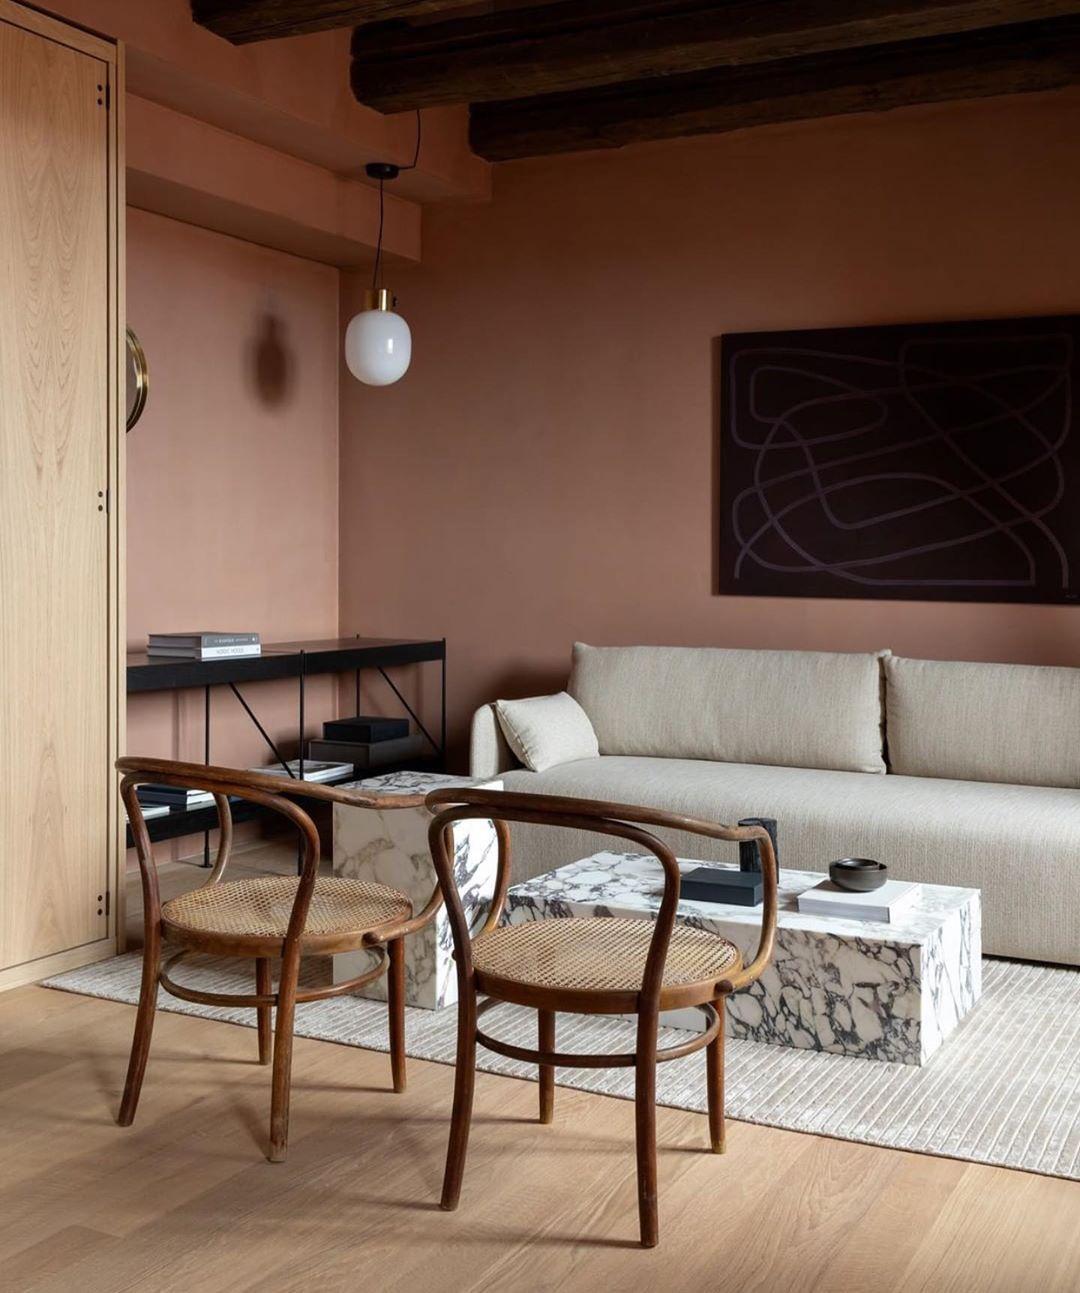 Artemiki On Instagram Feels So Good Menuworld Inspiration Style Fantasy Creativespace The Audo Interior Interior Design House Interior